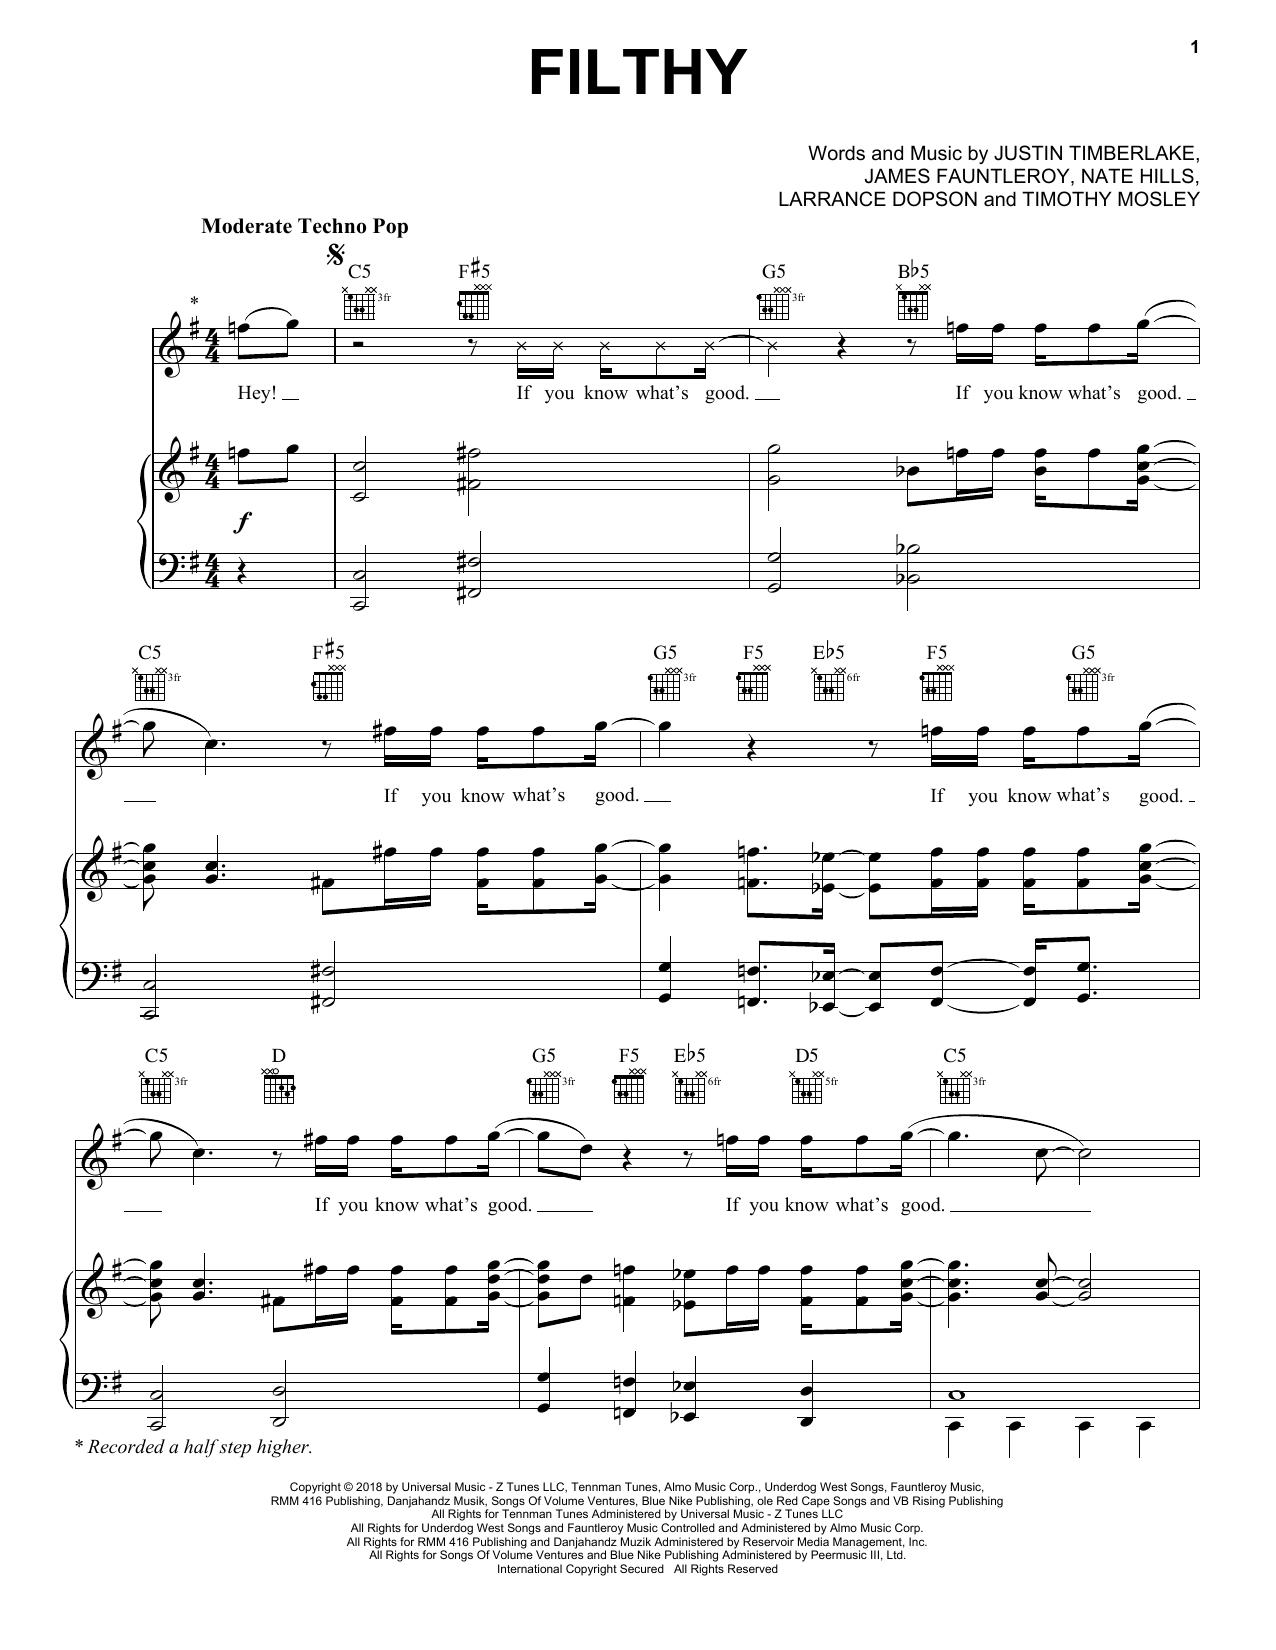 Justin Timberlake Filthy sheet music notes and chords. Download Printable PDF.